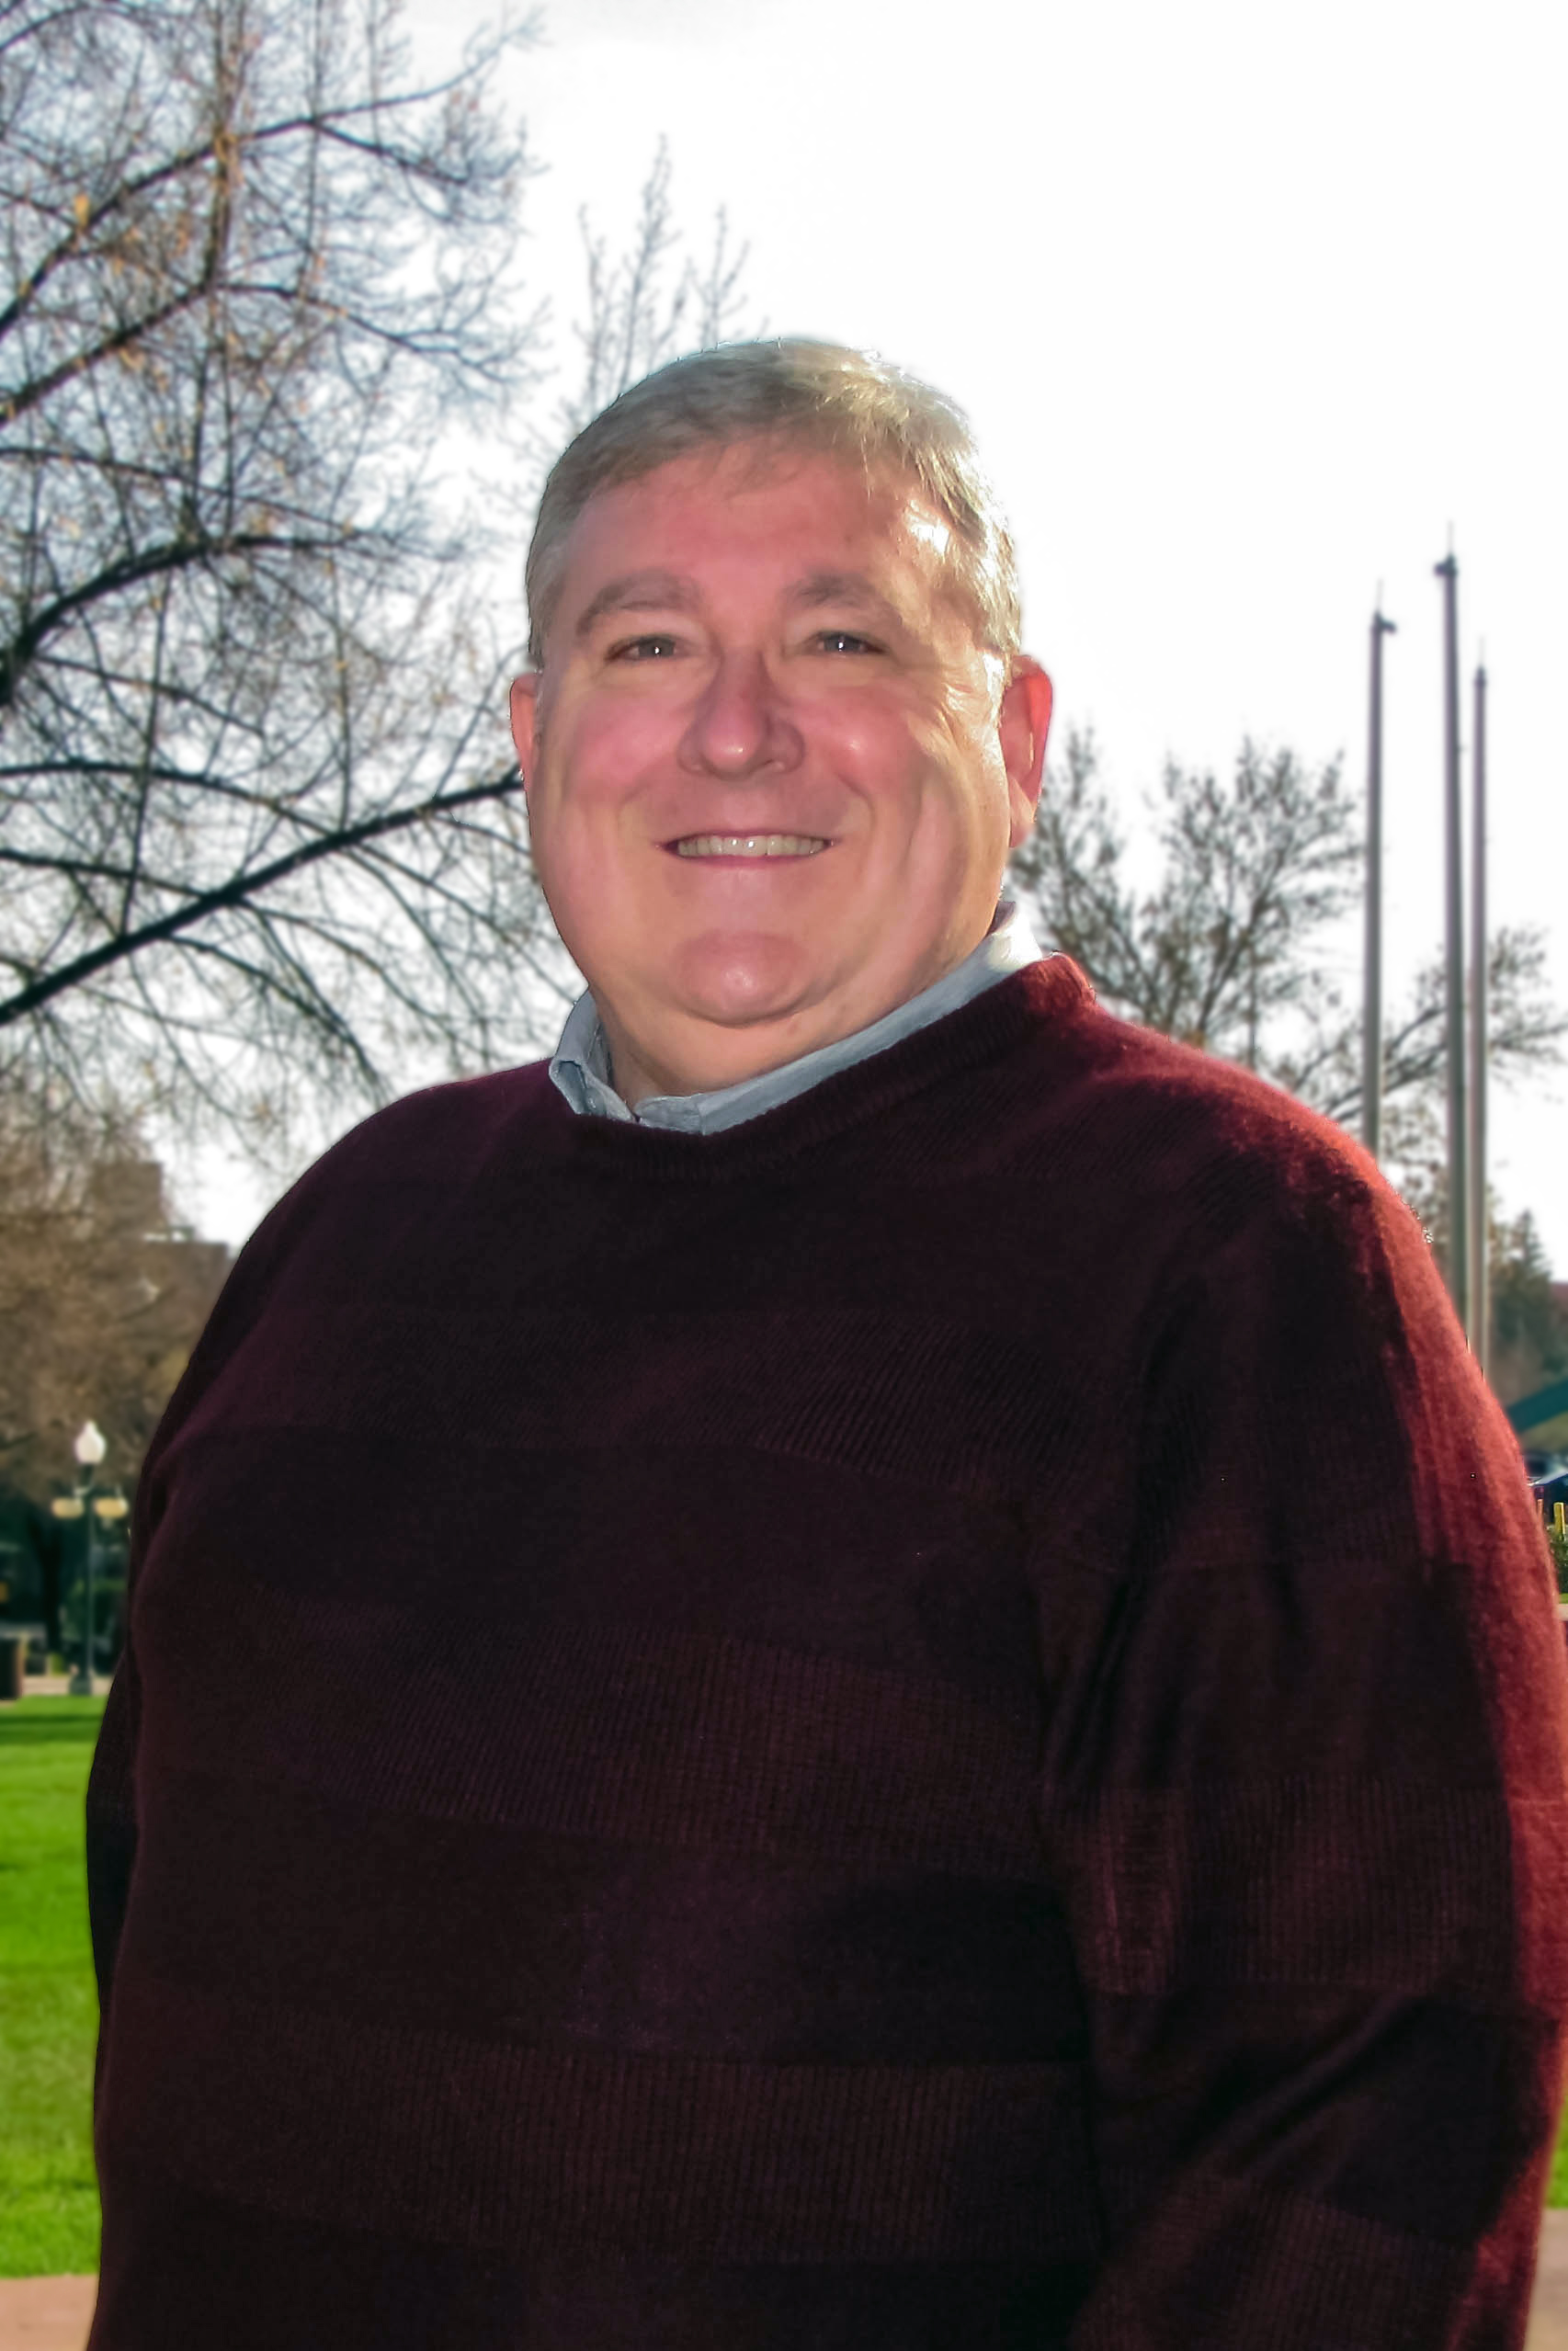 Rod Applegate